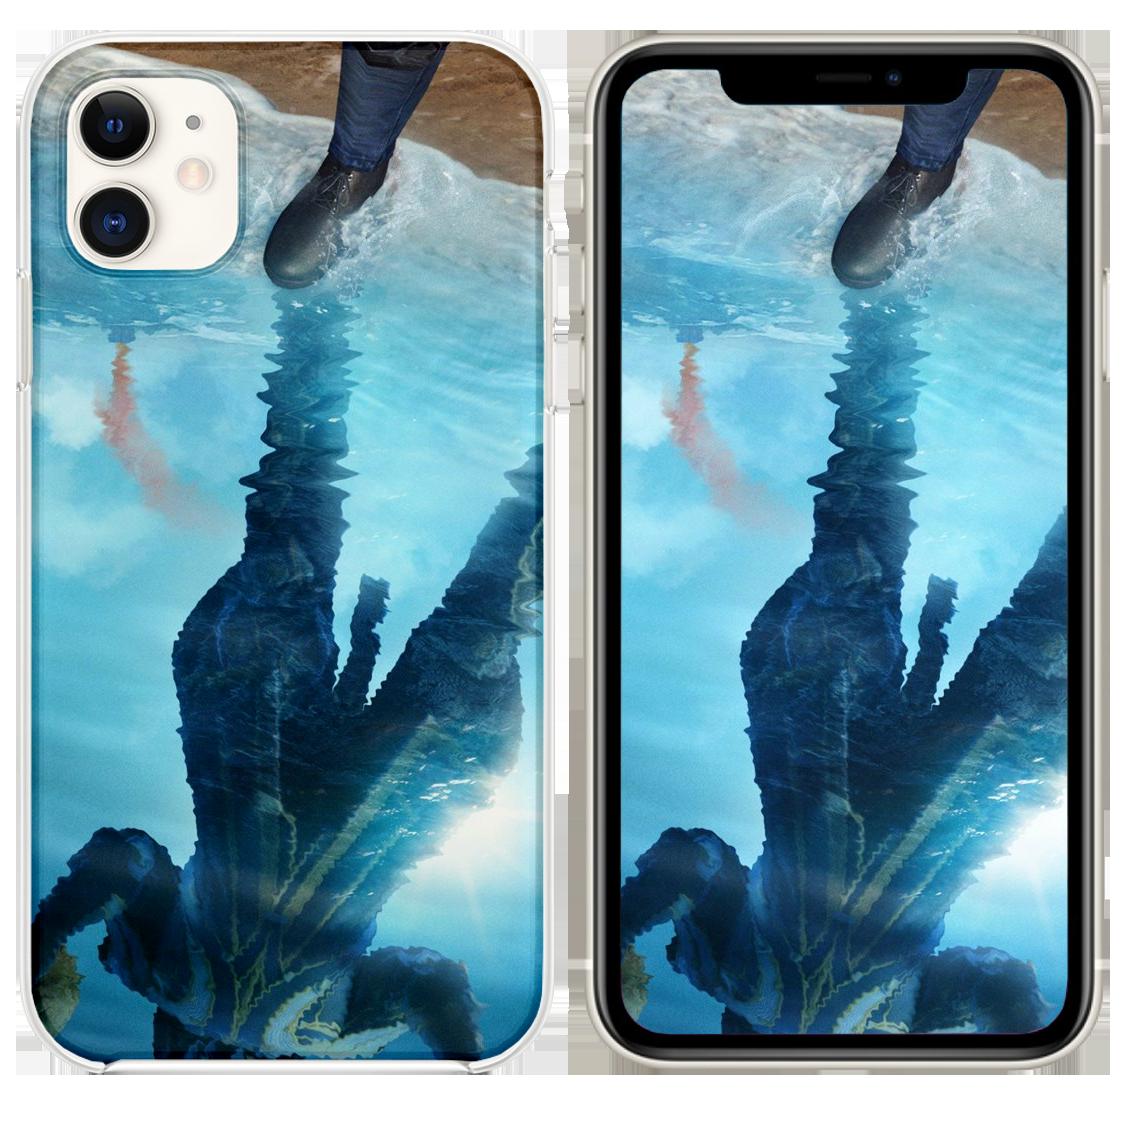 Best Iphone 11 Wallpaper: Pubg Season 8 2019 IPhone 11 Case